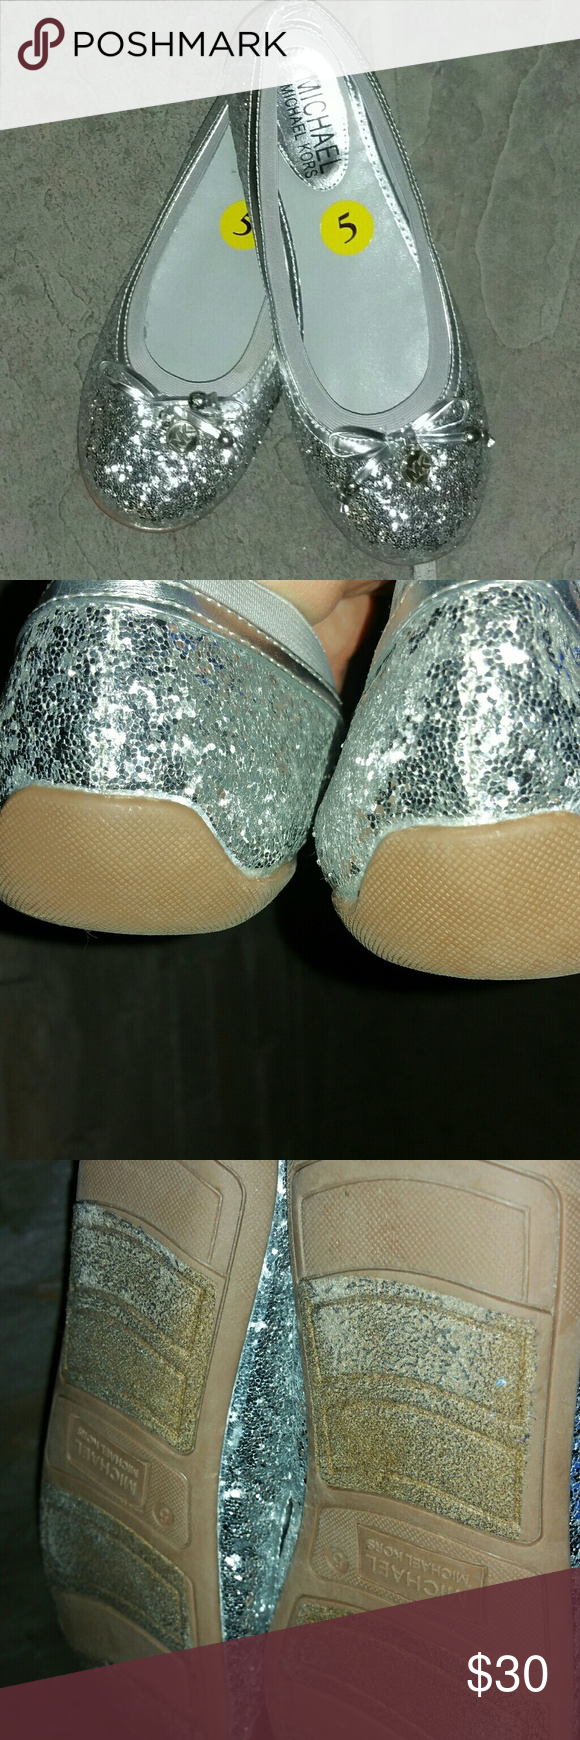 Michael Kors Glitter Flat In very good condition. MICHAEL Michael Kors Shoes Flats & Loafers